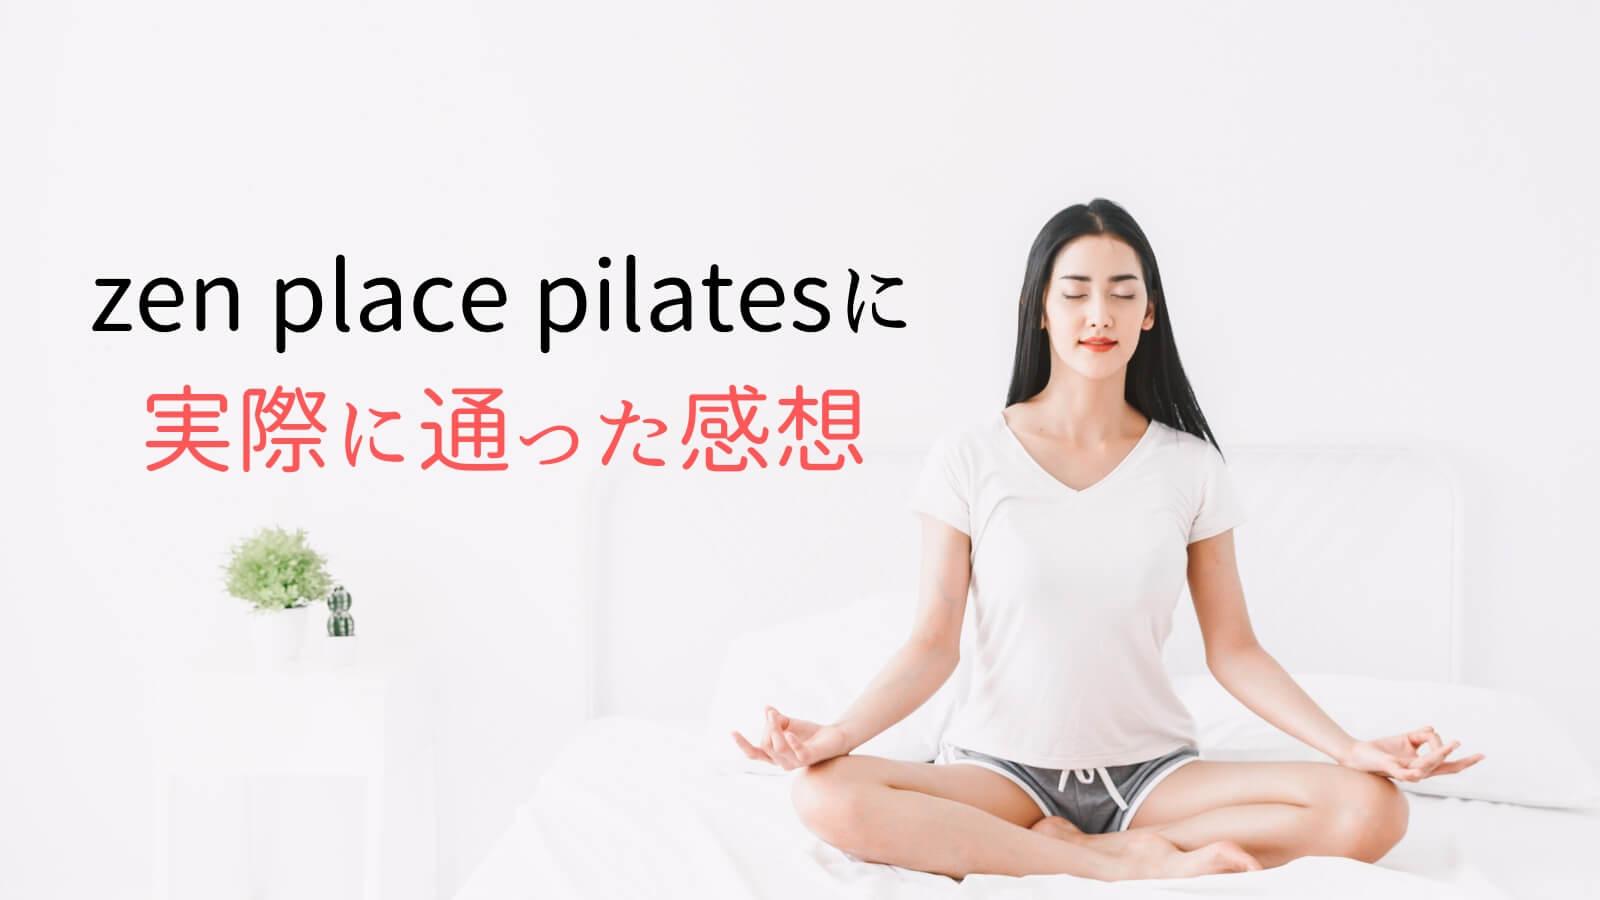 zen place pilates(ゼンプレイスピラティス)の体験に行った感想